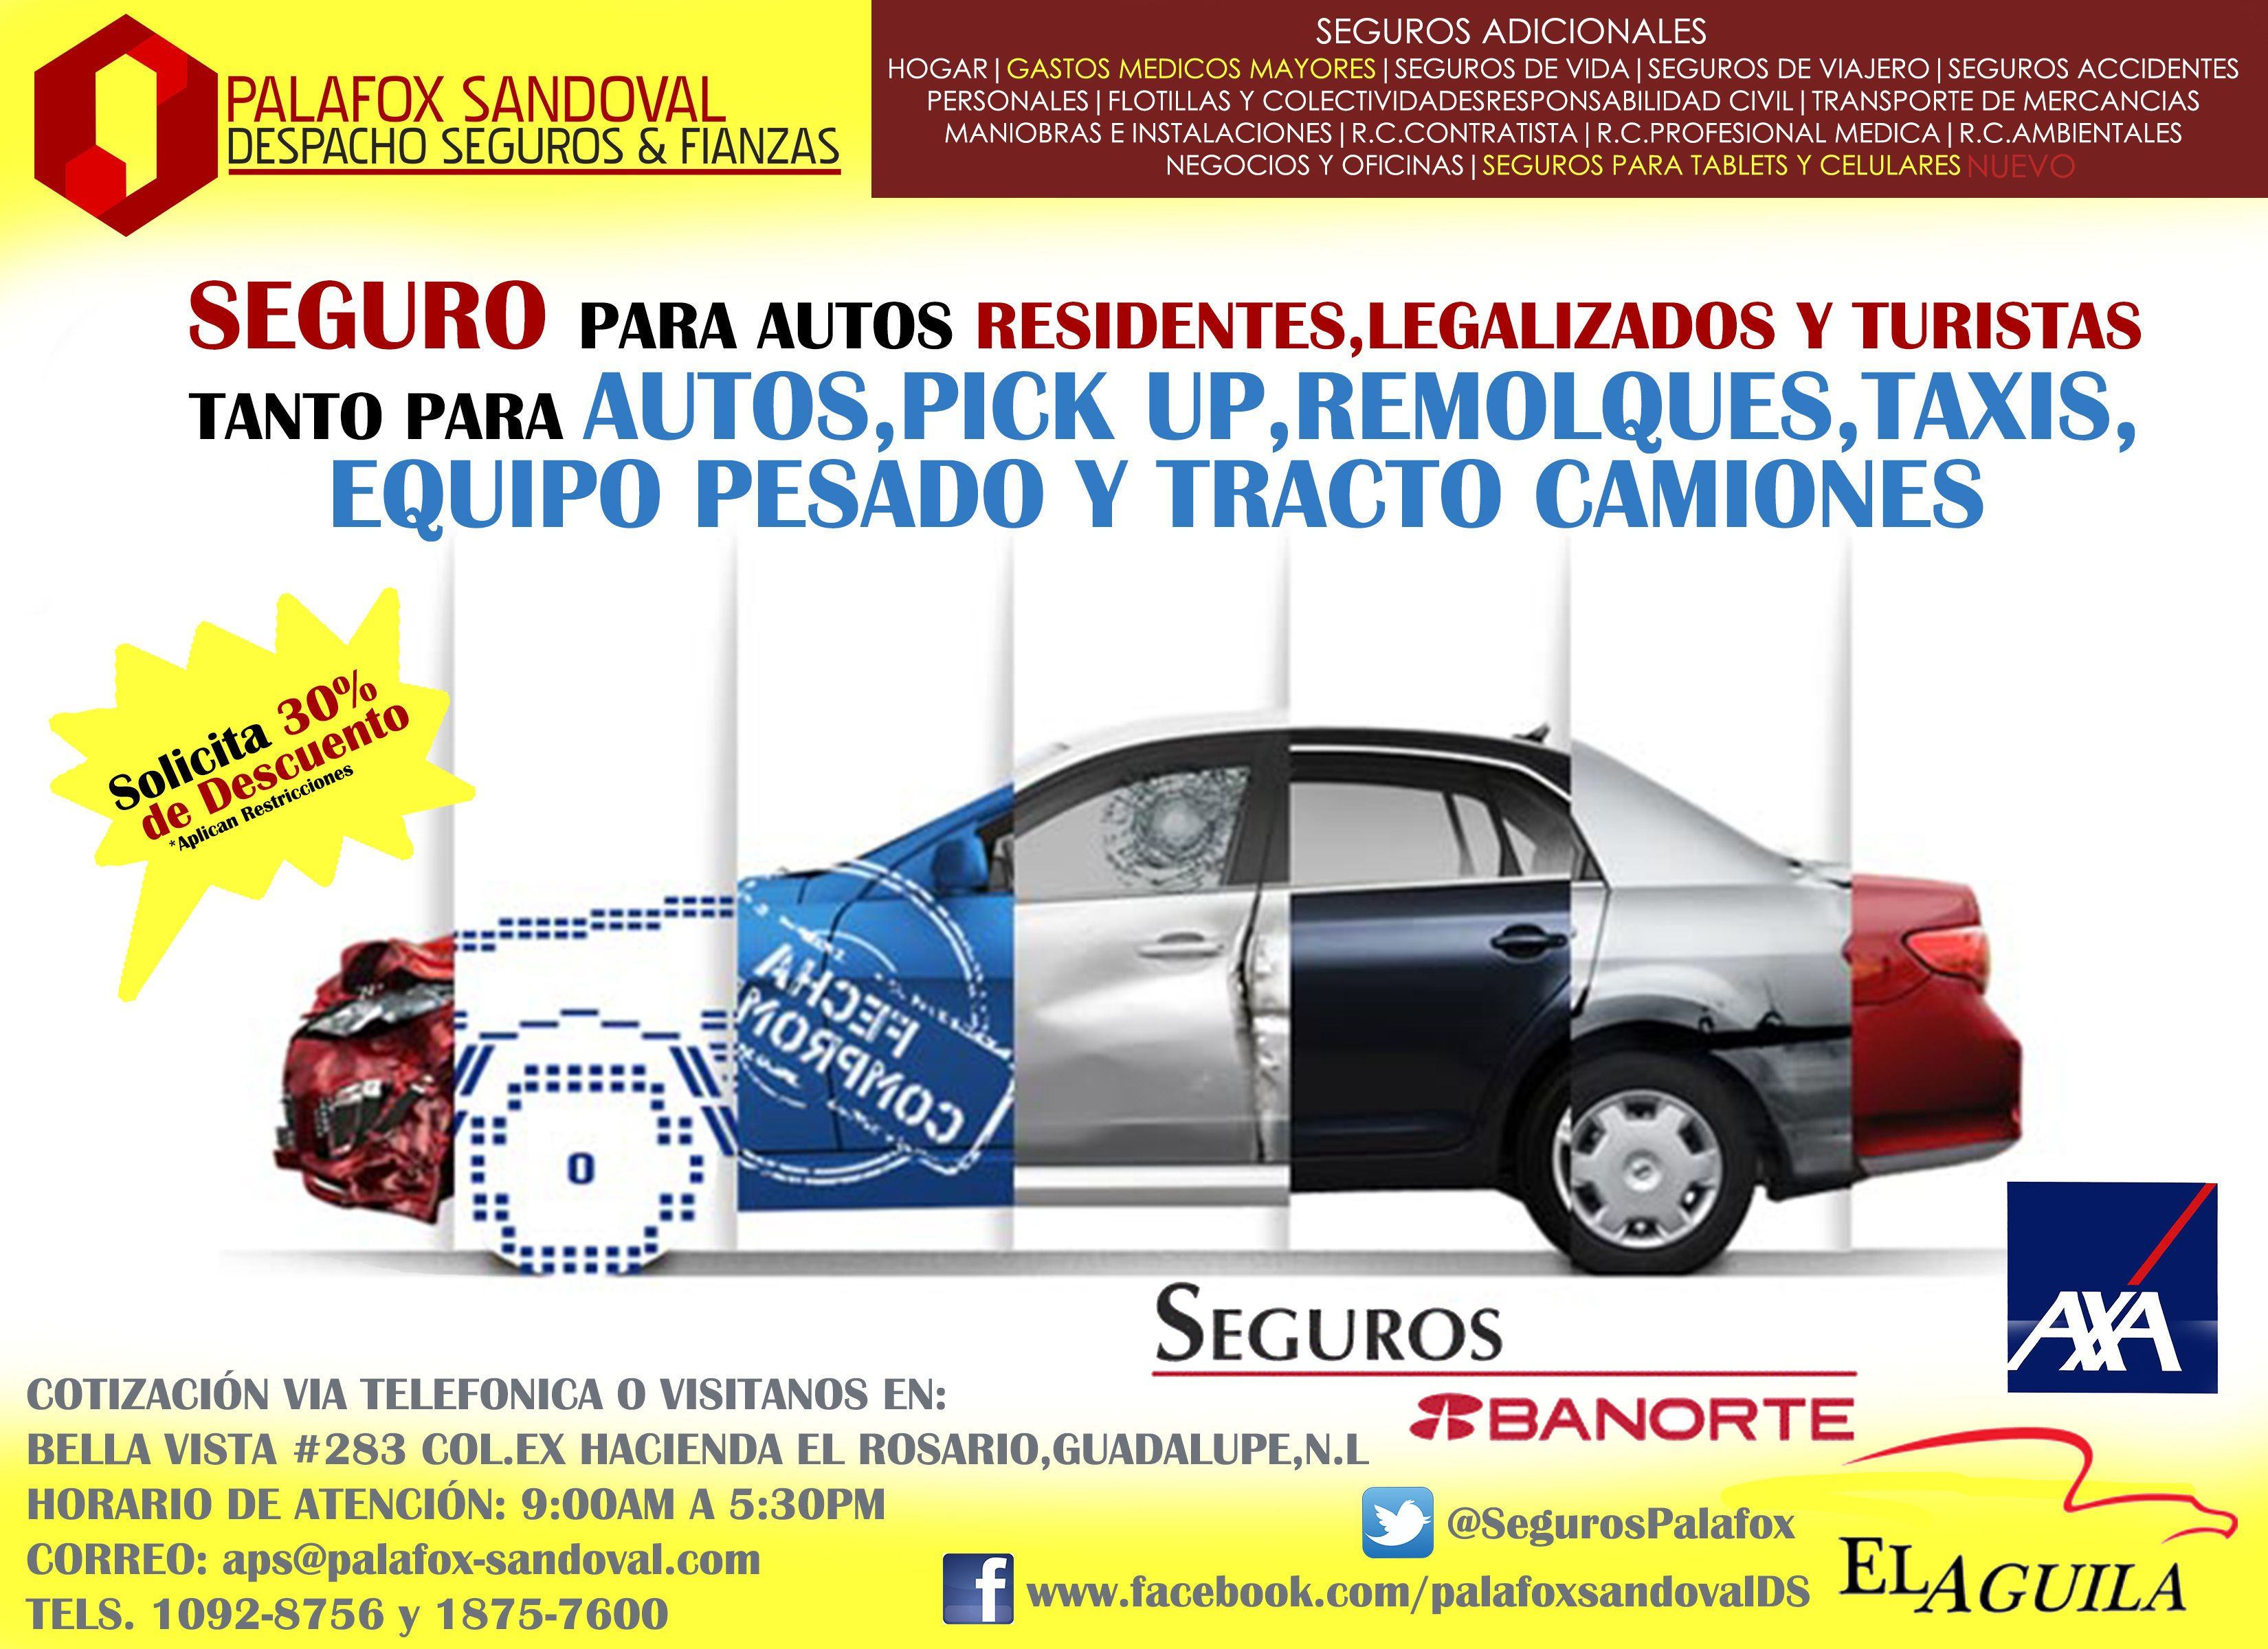 Seguro para tu automóvil #DisfrutaLaVidaSinRiesgos | Seguros para ...